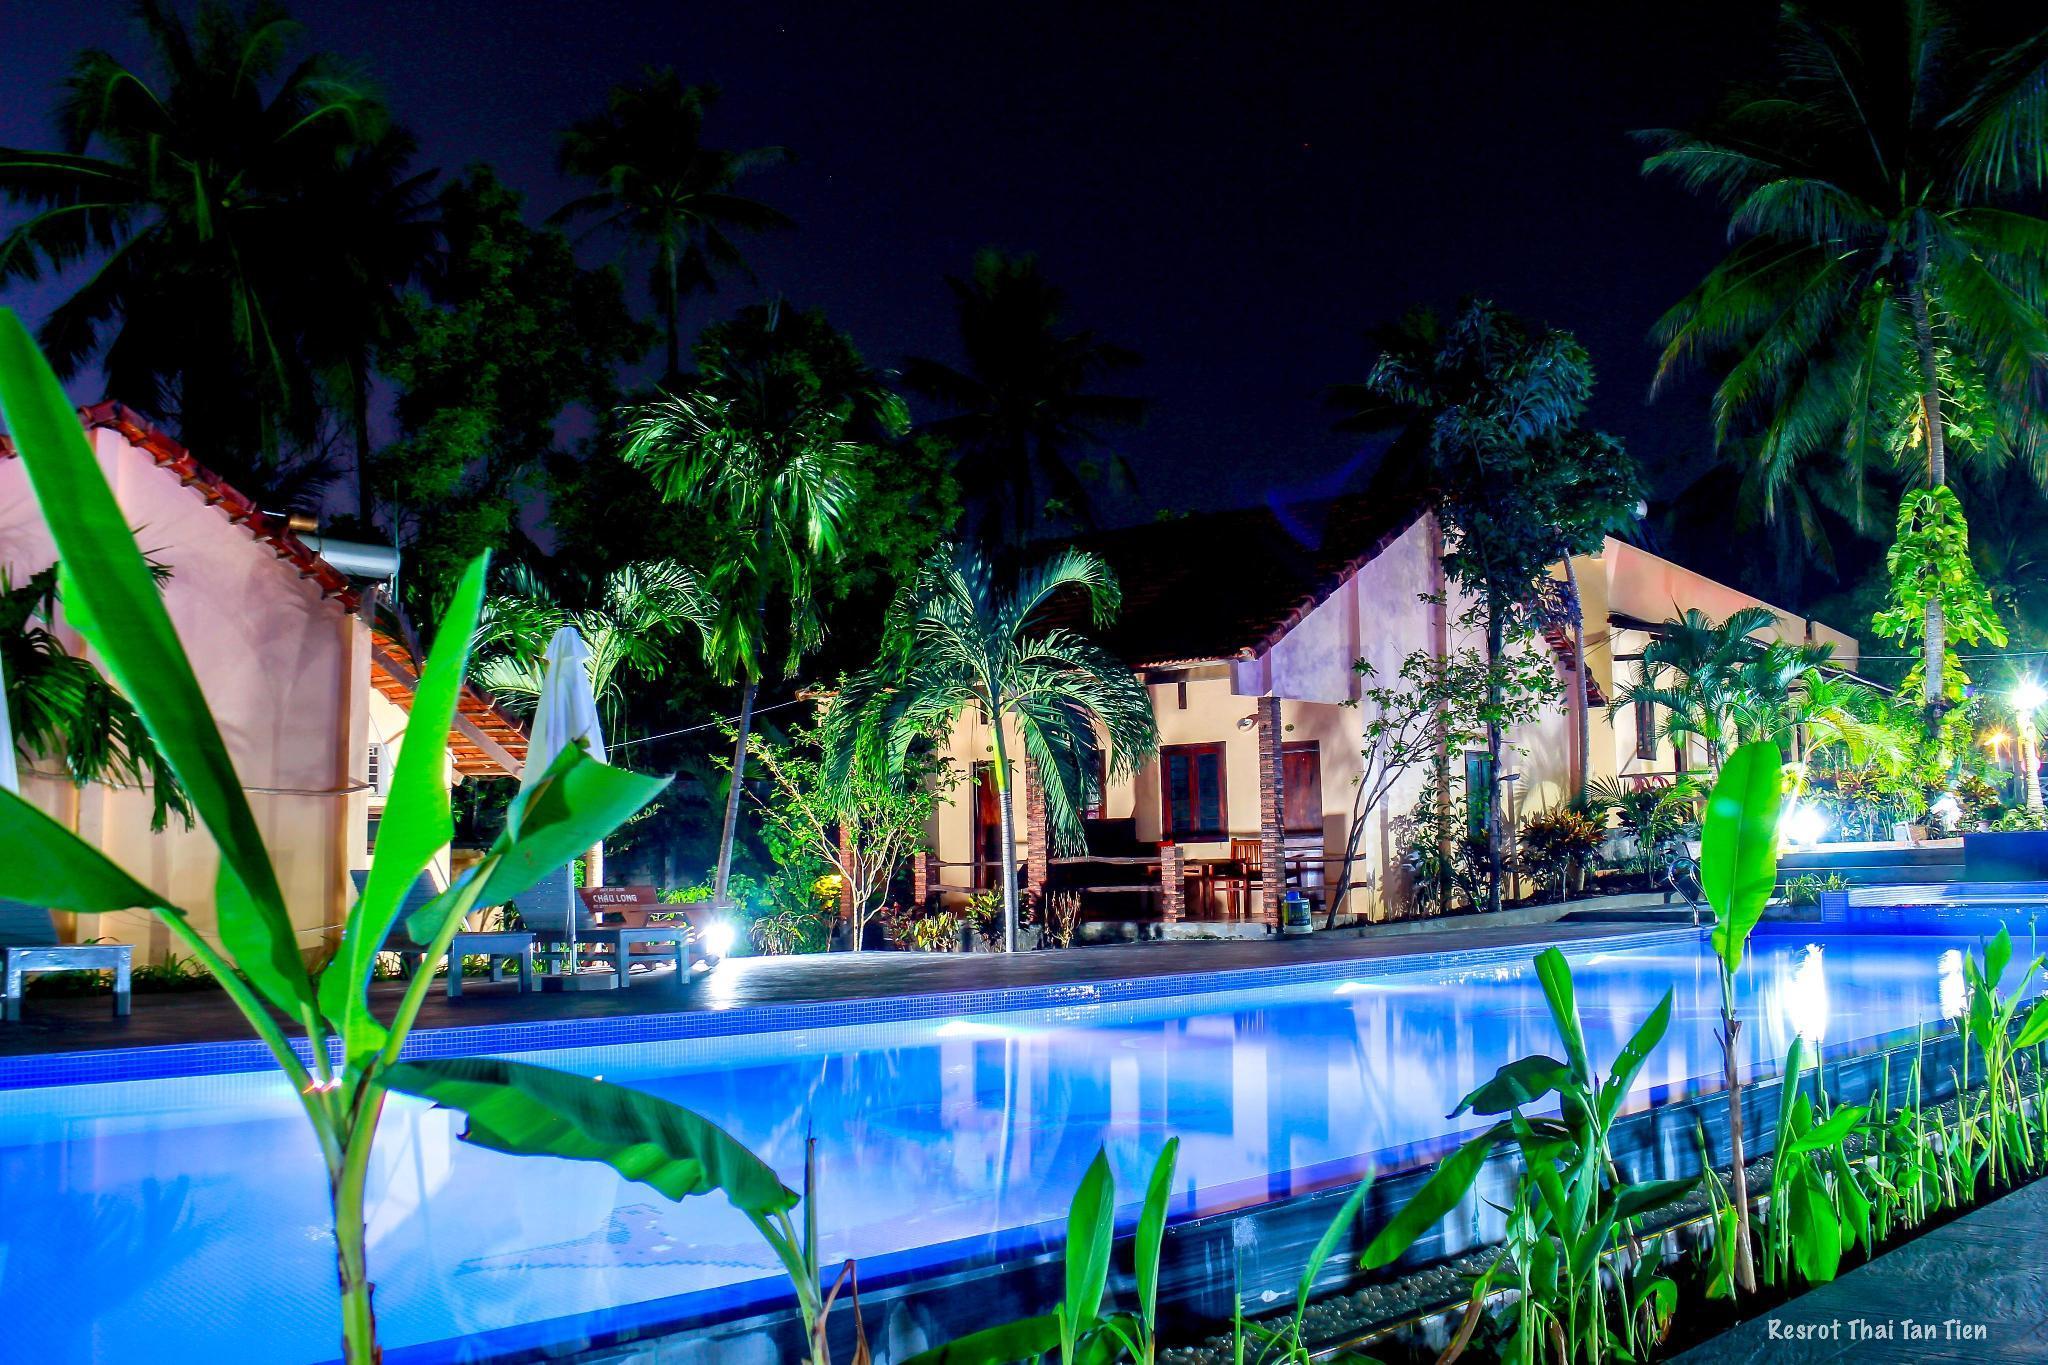 thai tan tien resort phu quoc island from 19 save on agoda rh agoda com